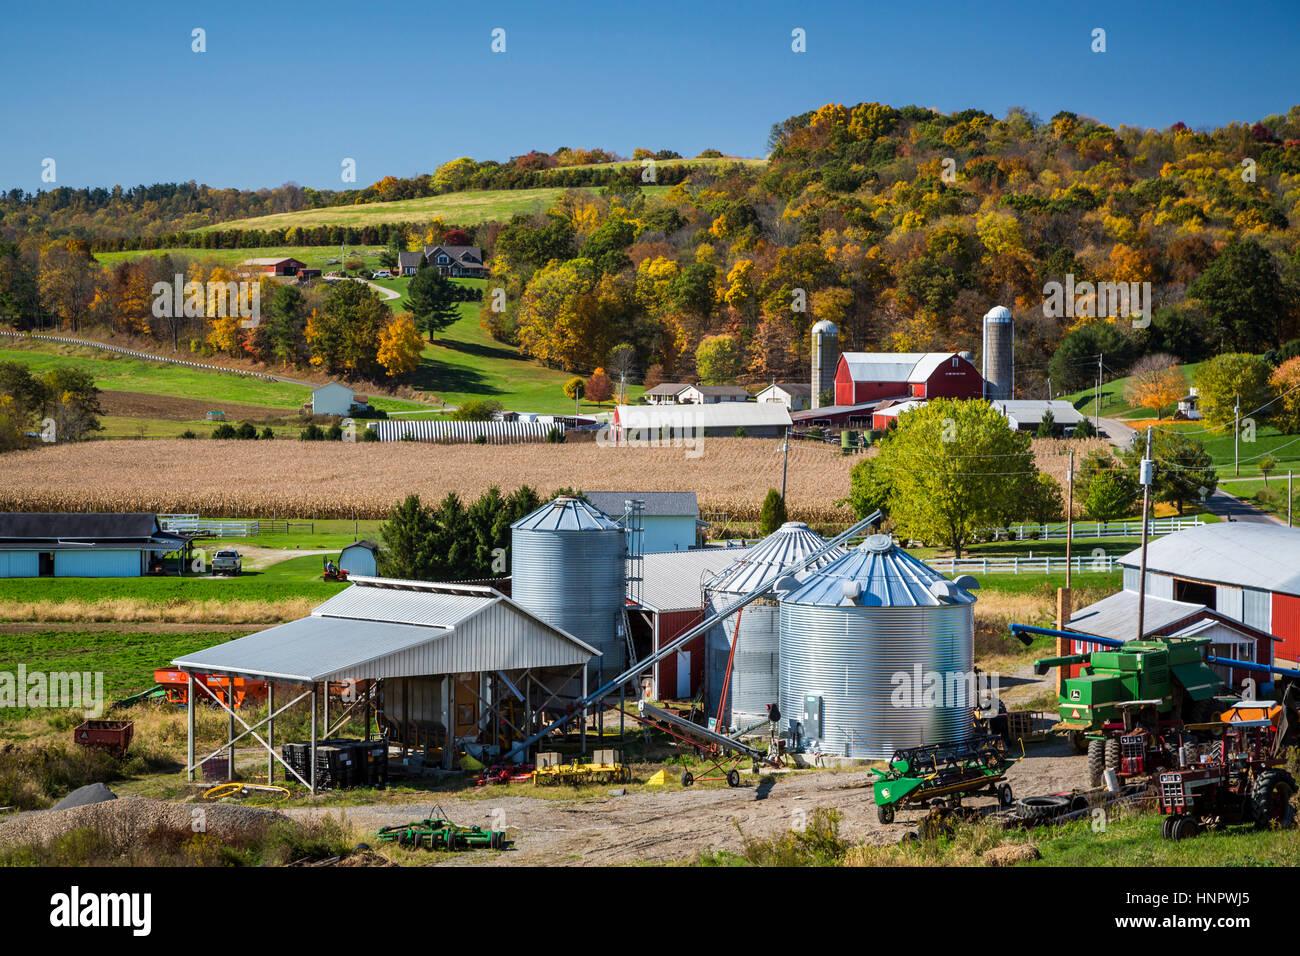 A farm in Coshocton County, Ohio, USA. - Stock Image